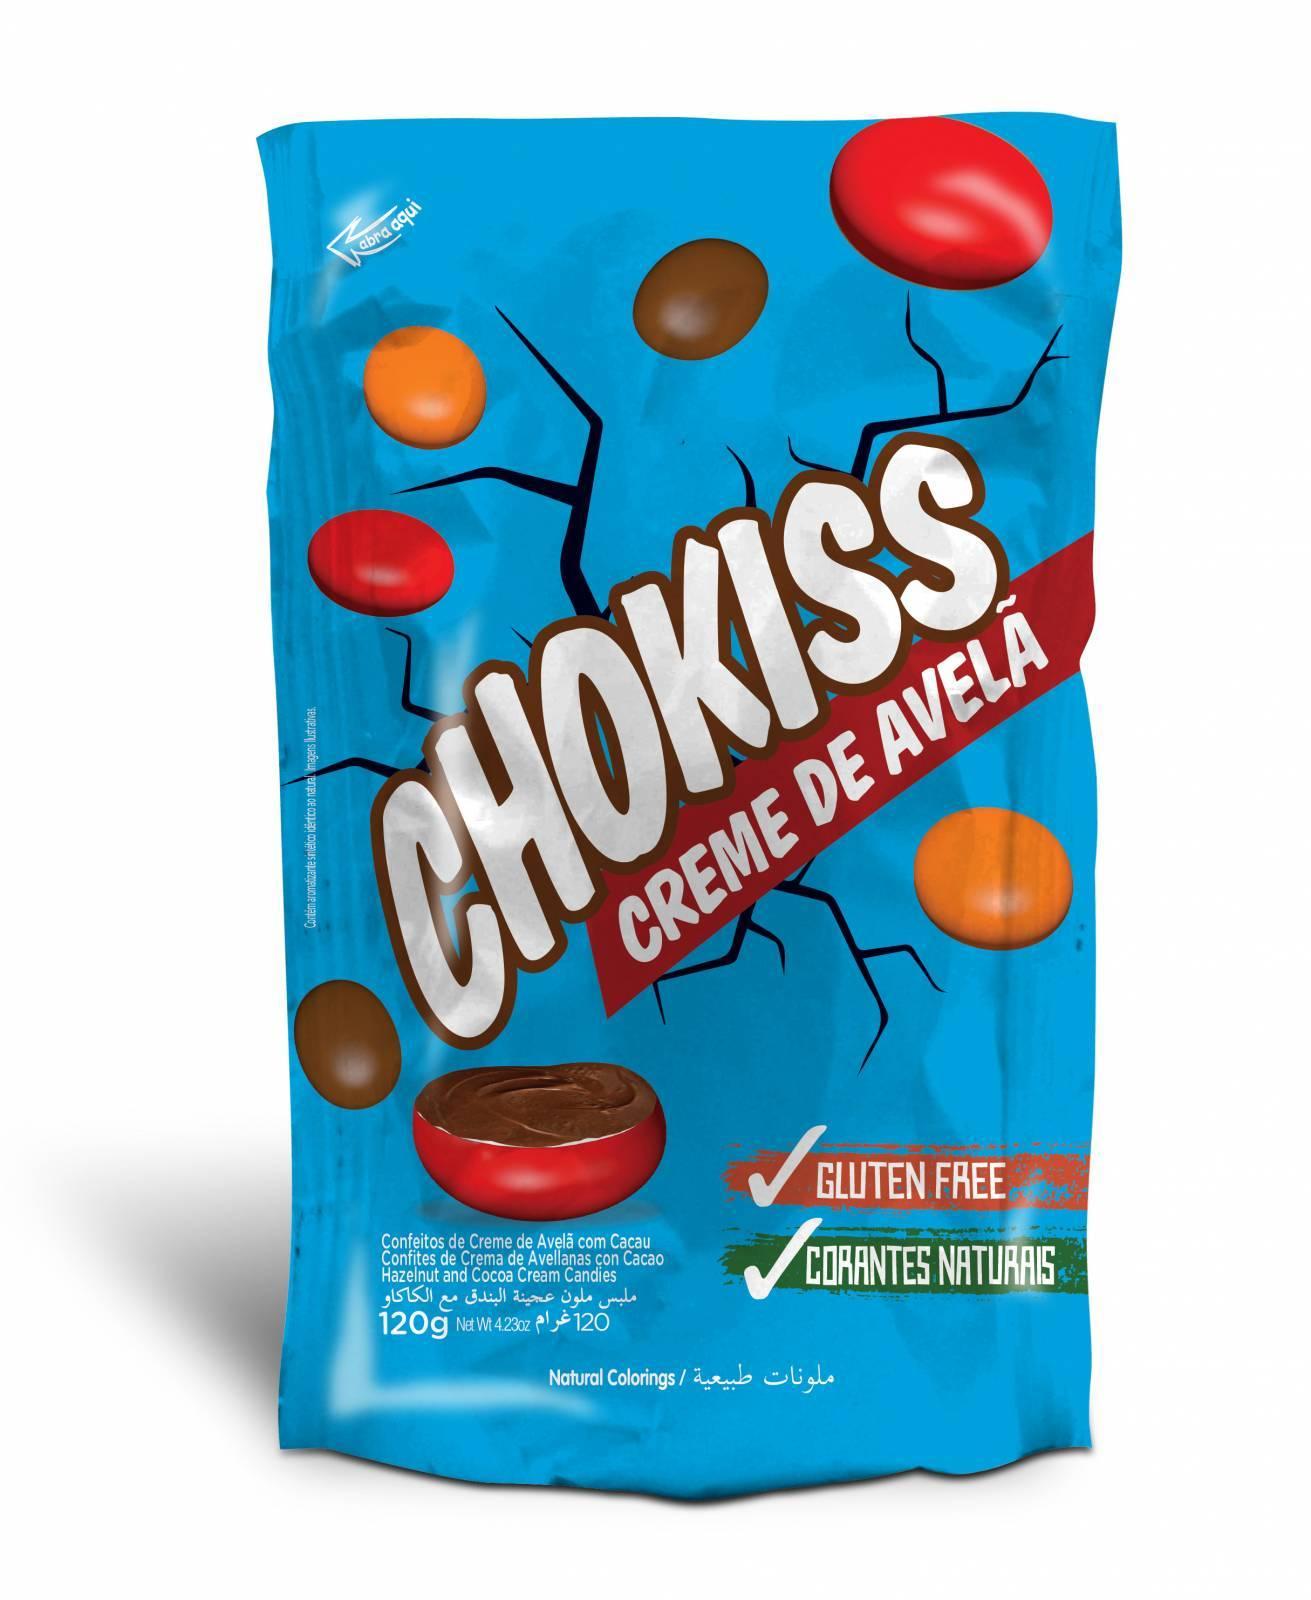 Chokiss Creme de Avelã 120g. - Jazam Alimentos